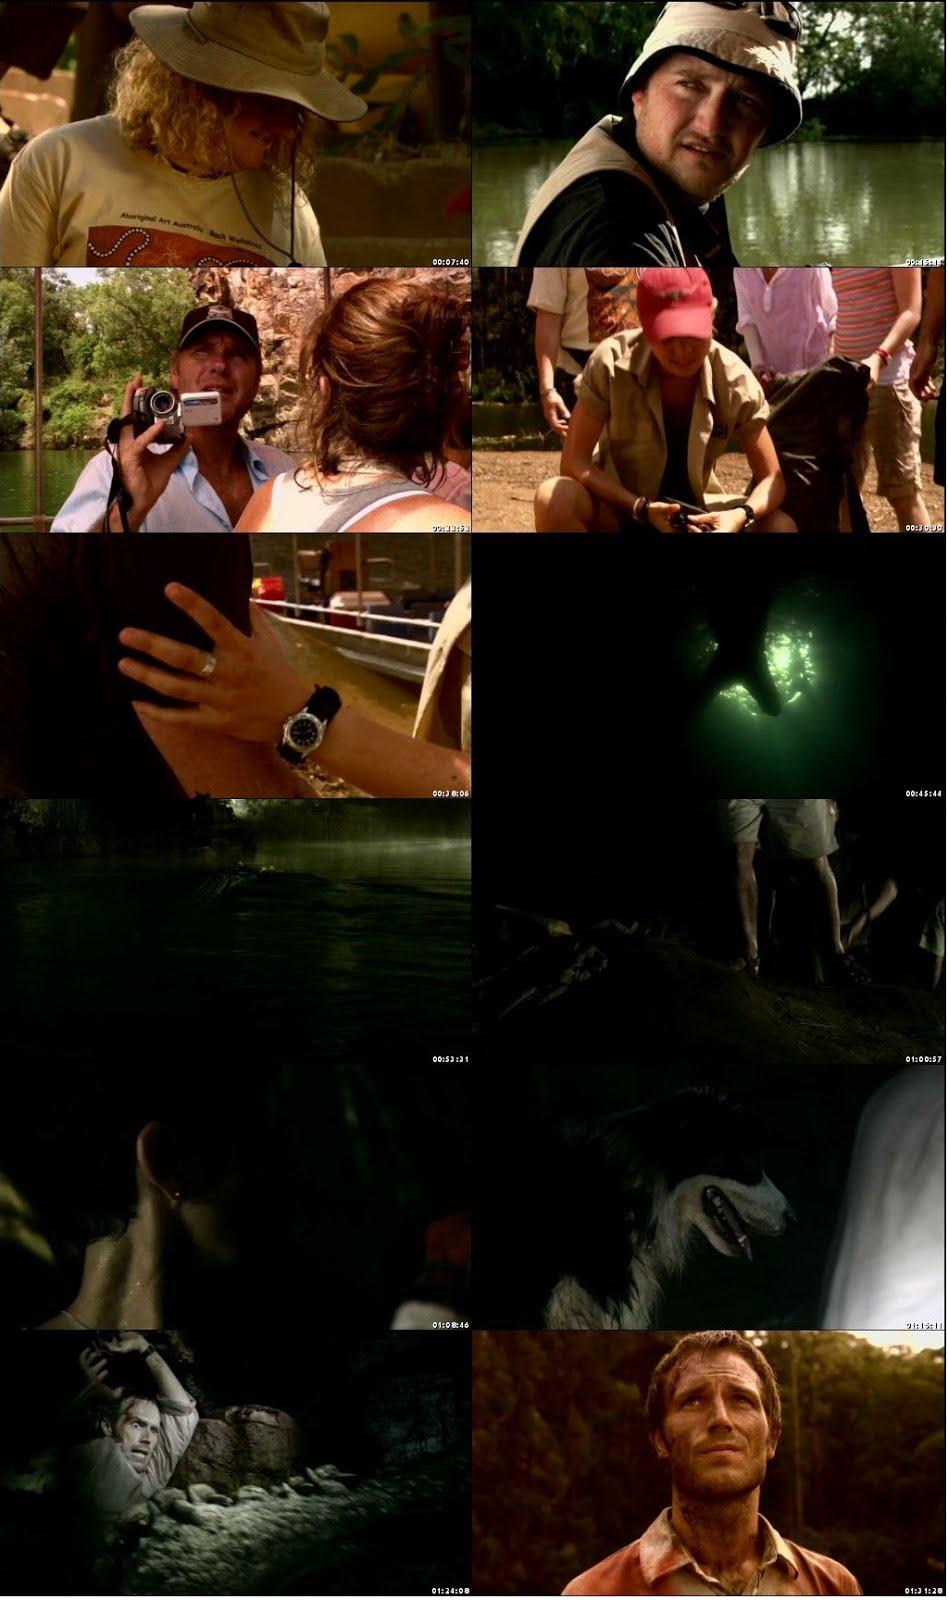 pathfinder 2007 movie download dual audio hindi dubbed